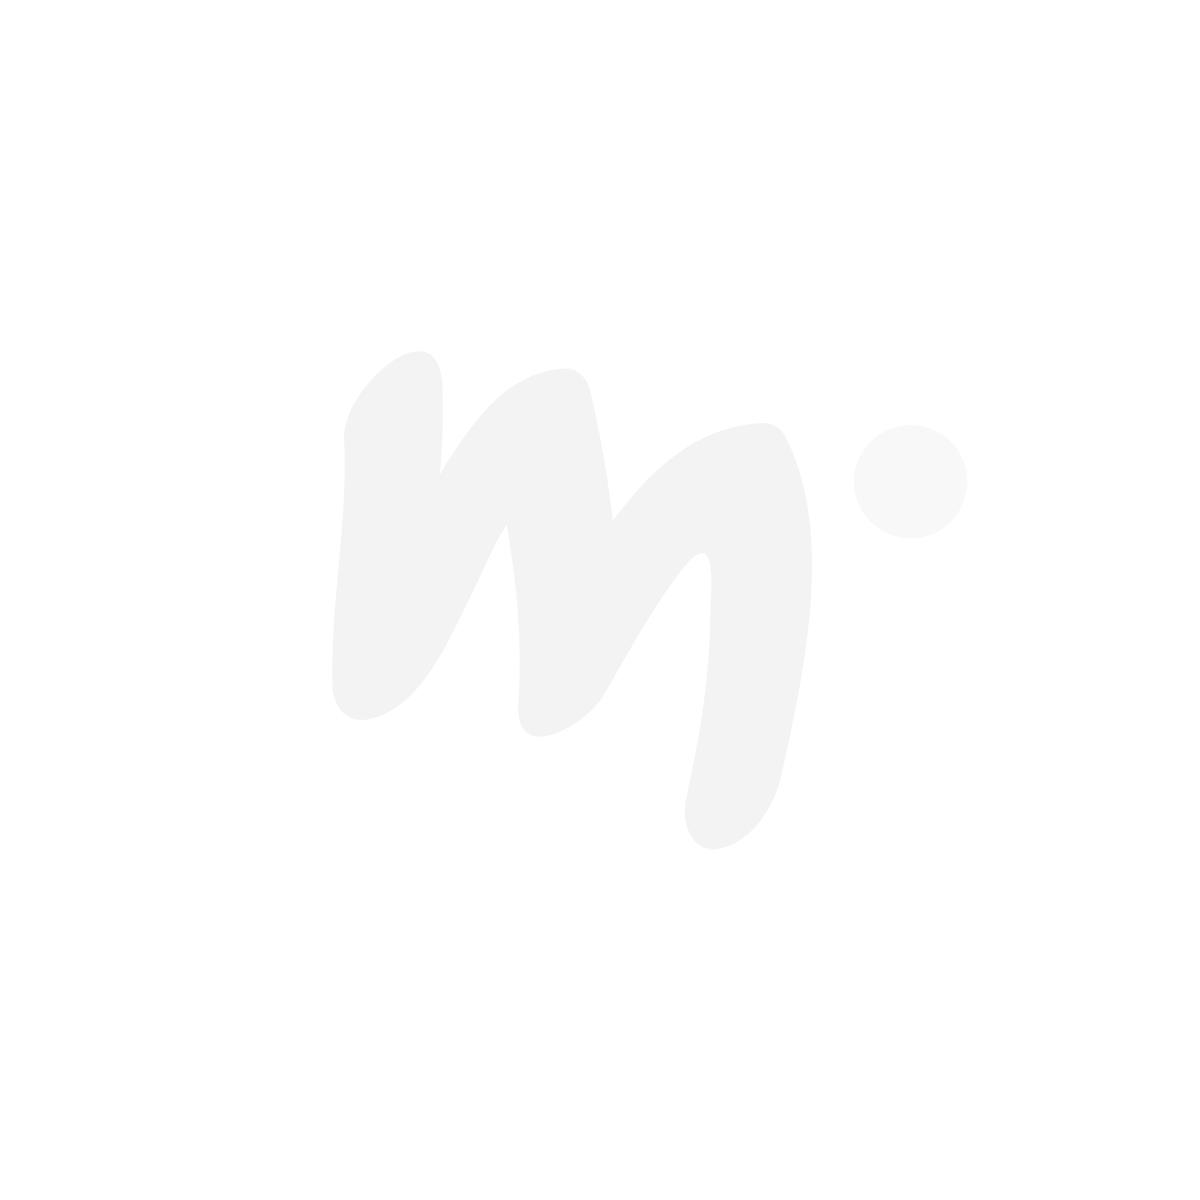 Peppi Pitkätossu Peppi-tossut mustavalkoinen